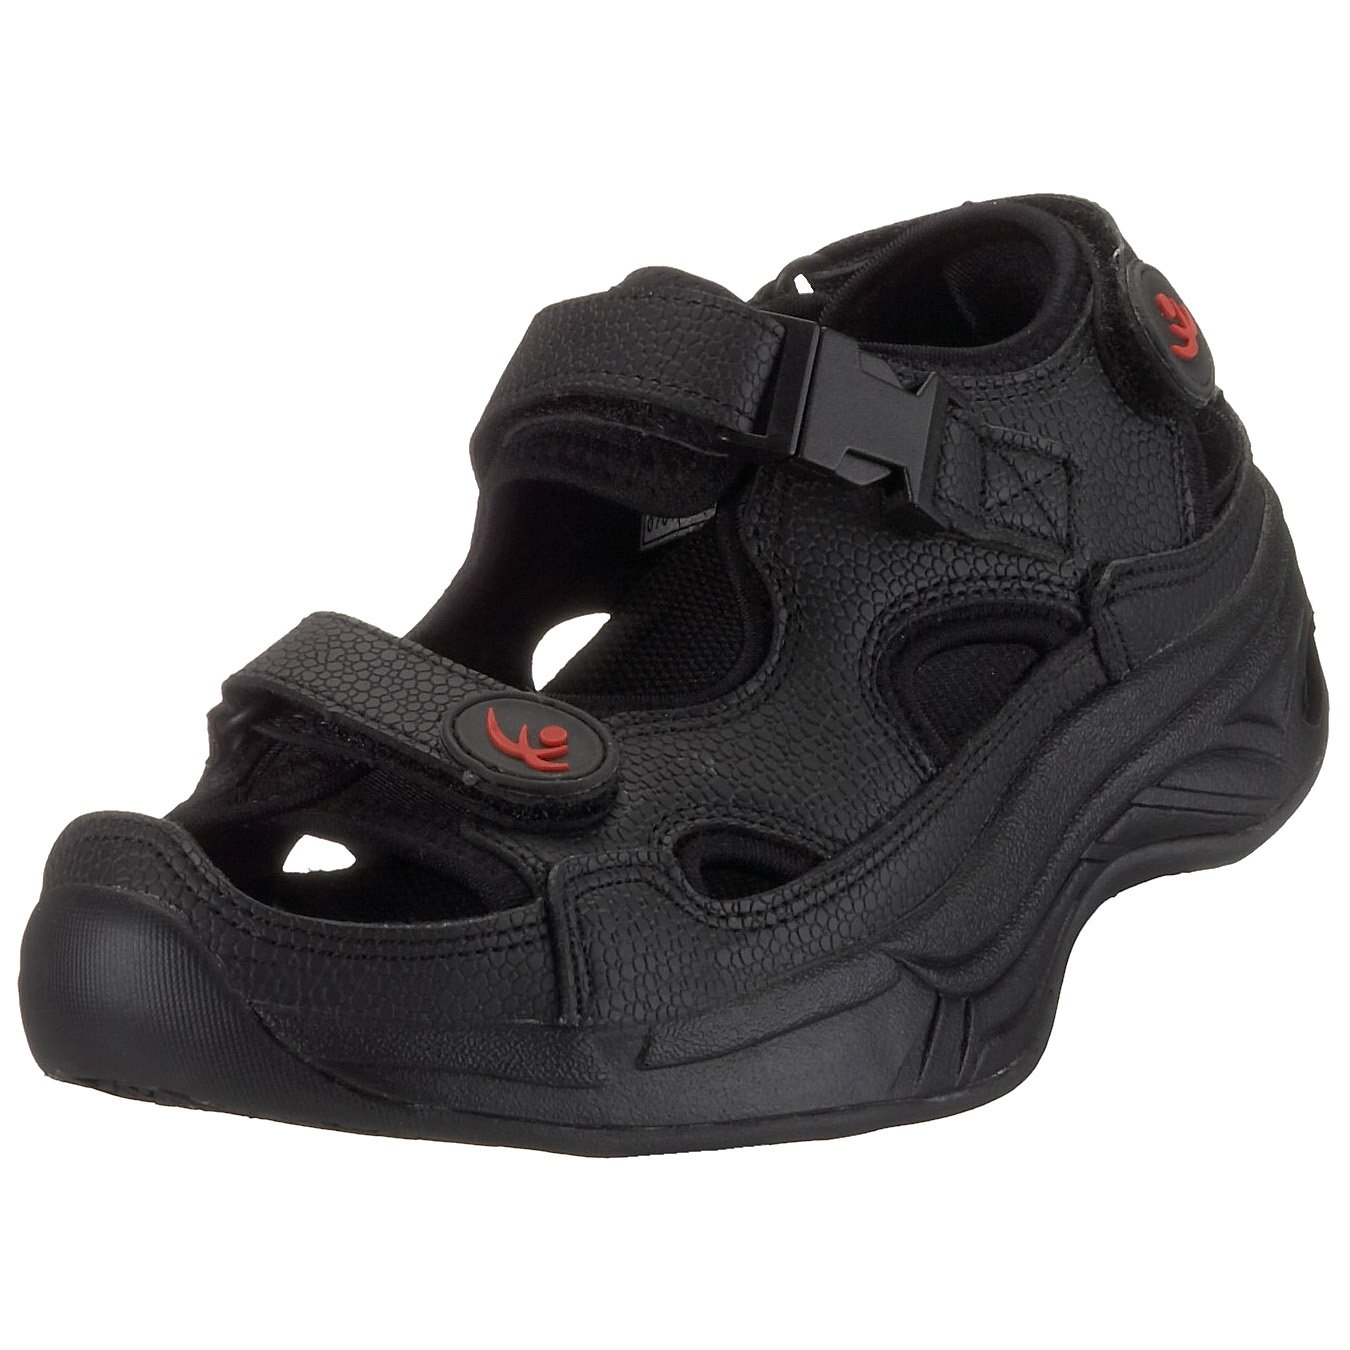 Chung Shi 9100095 AuBioRiG Comfort Step Sandale 9100095 Shi Damen Outdoor Sandalen Schwarz (schwarz) 887eb9